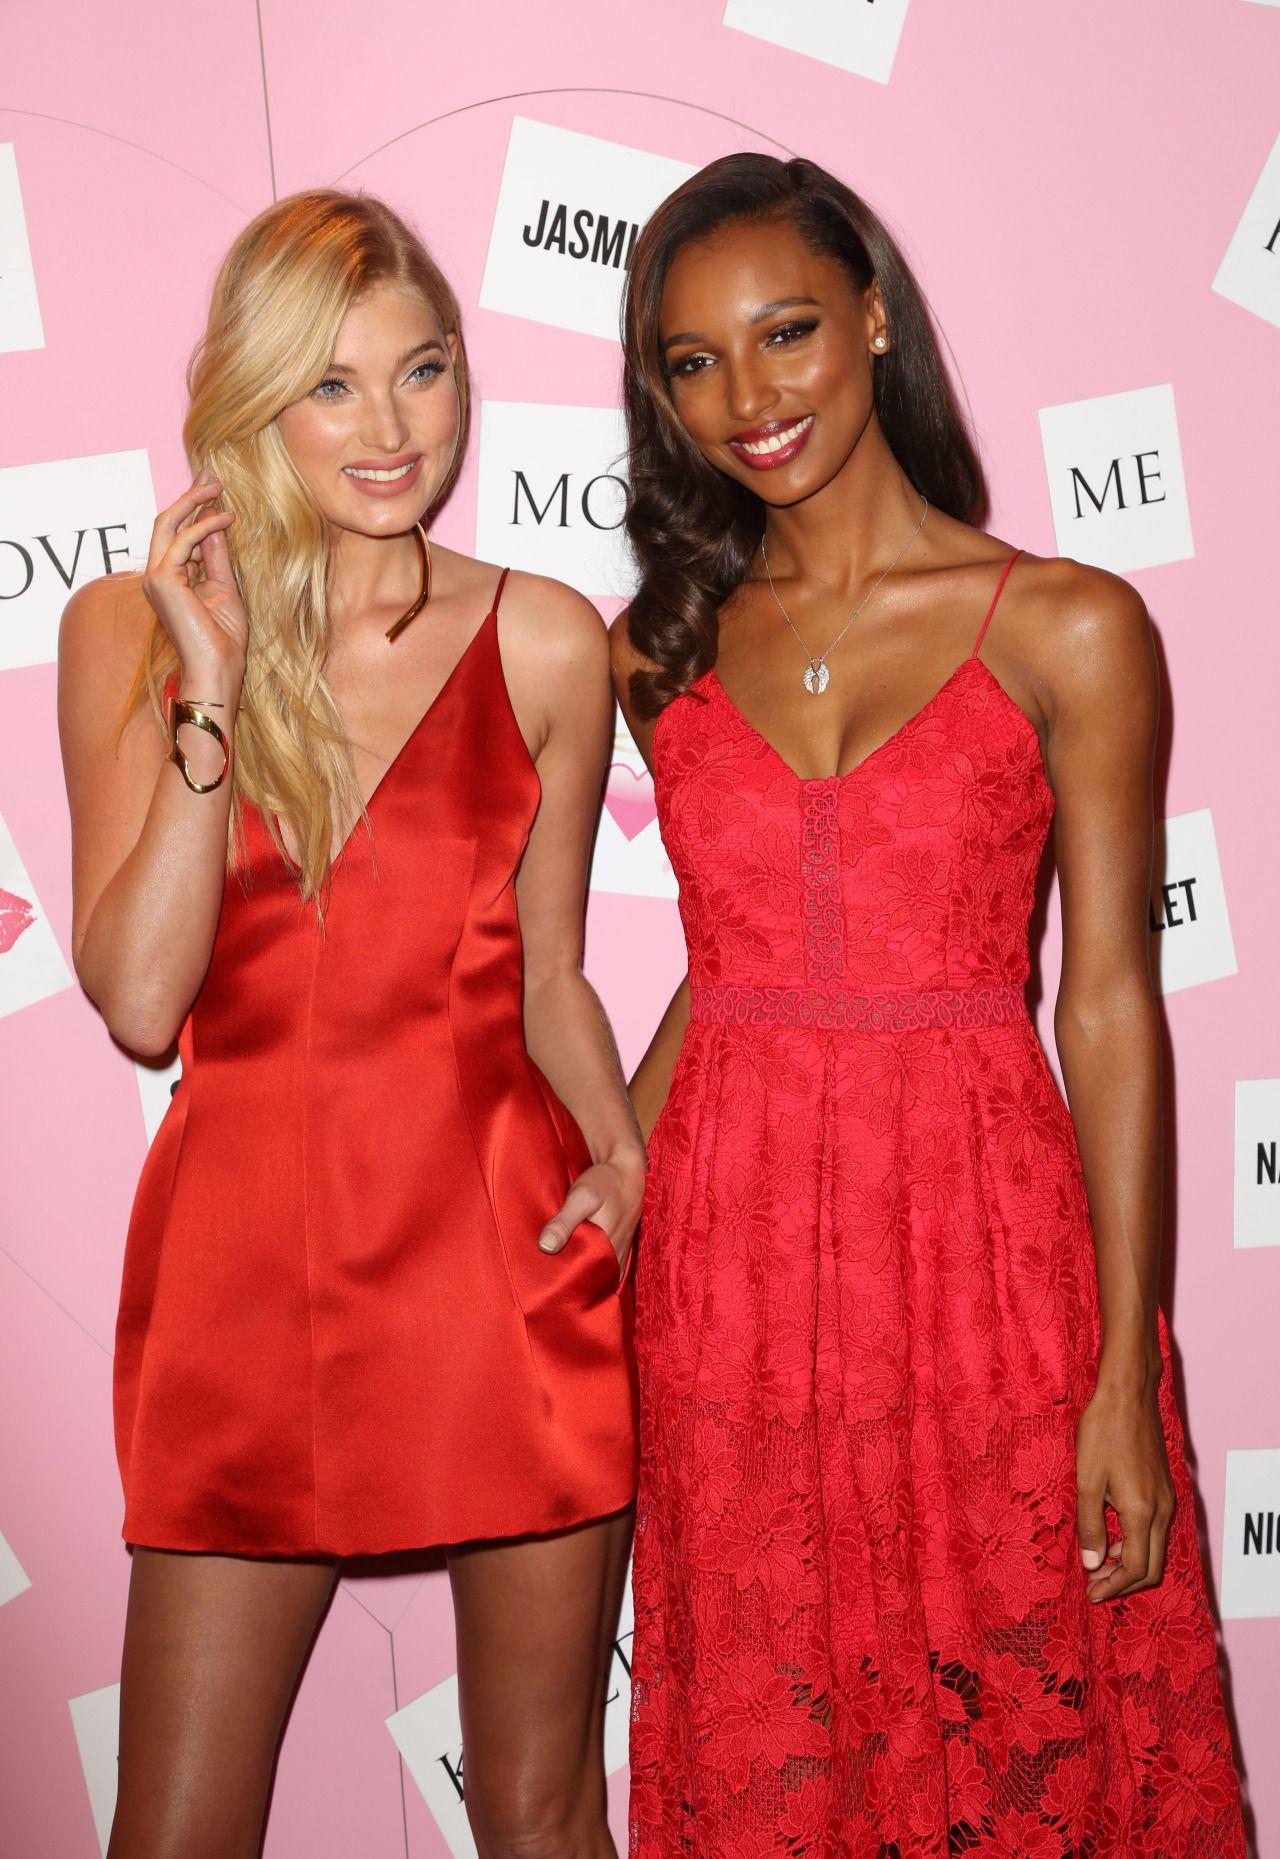 Elsa Hosk & Jasmine Tookes celebrates Valentine's Day at Victoria's Secret on February 9, 2016 in New York City